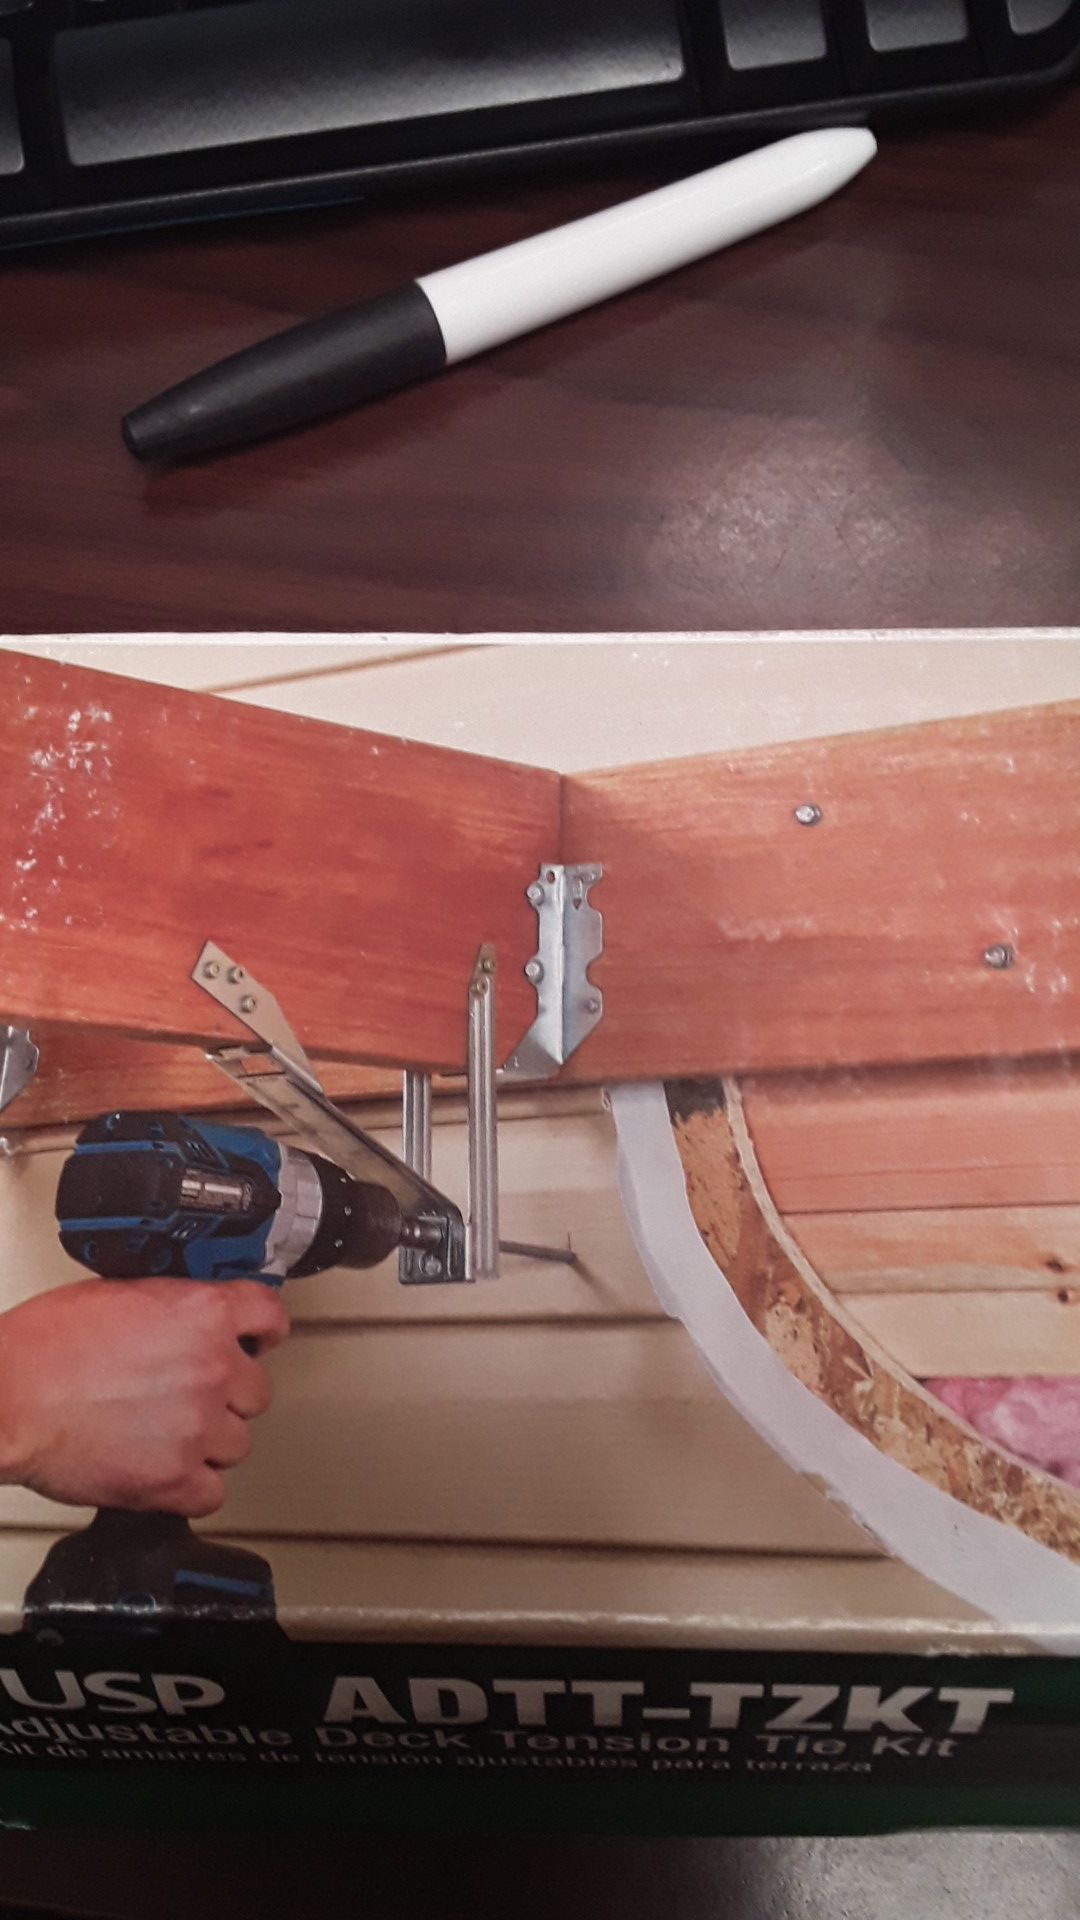 Adjustable Deck Tension Tie Kit